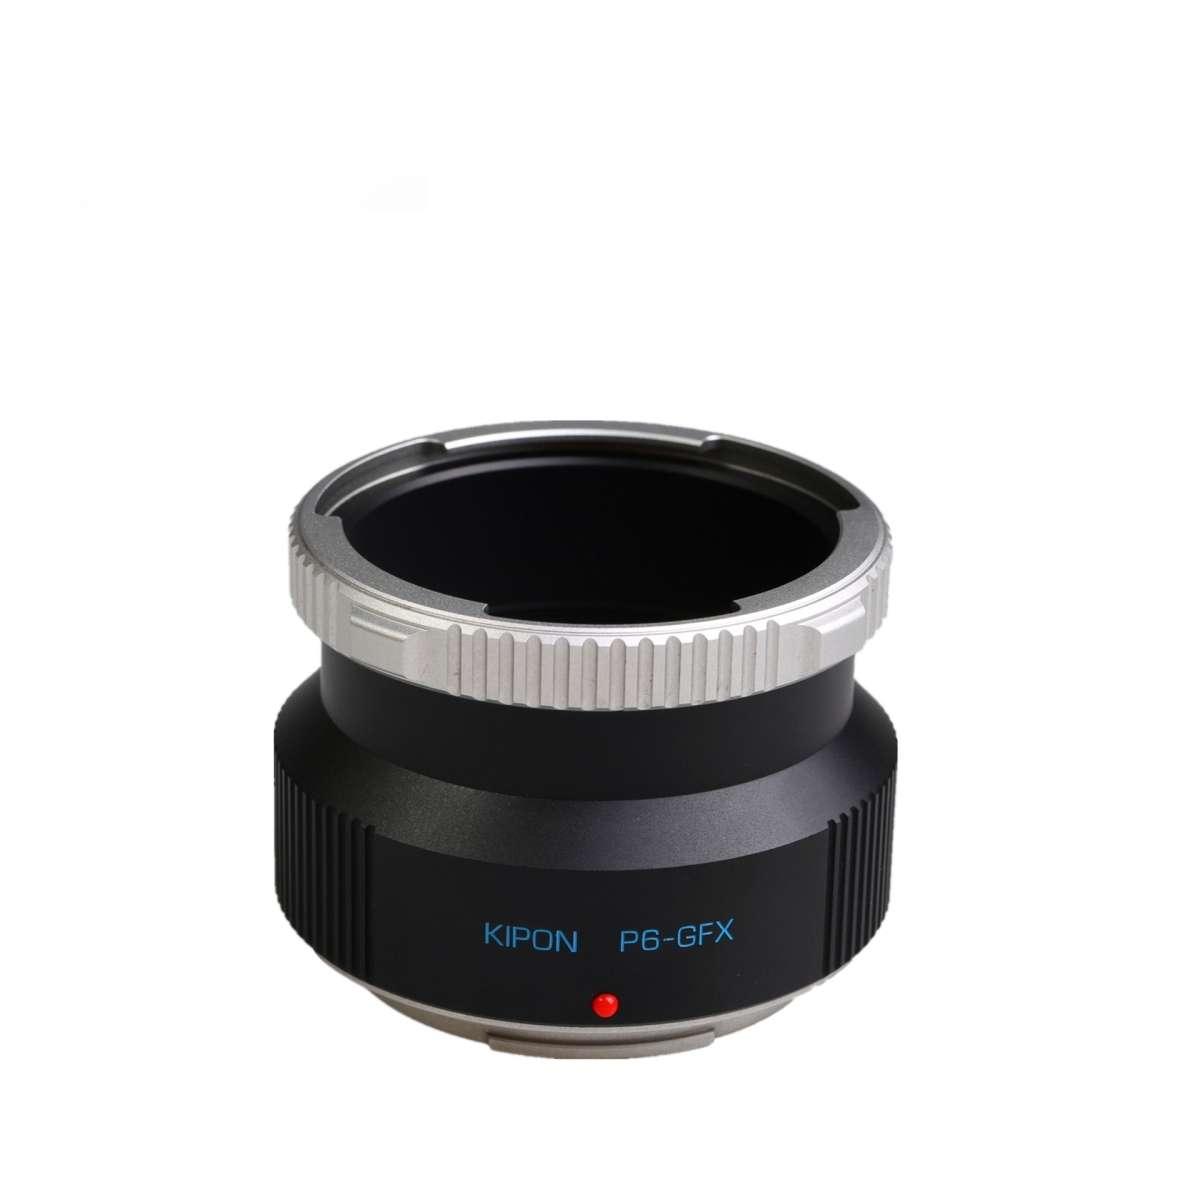 Kipon Adapter Fr Pentacon 6 Auf Fuji Gfx Foto Walser Mamiya 645 Mount Lens To Medium Format Camera